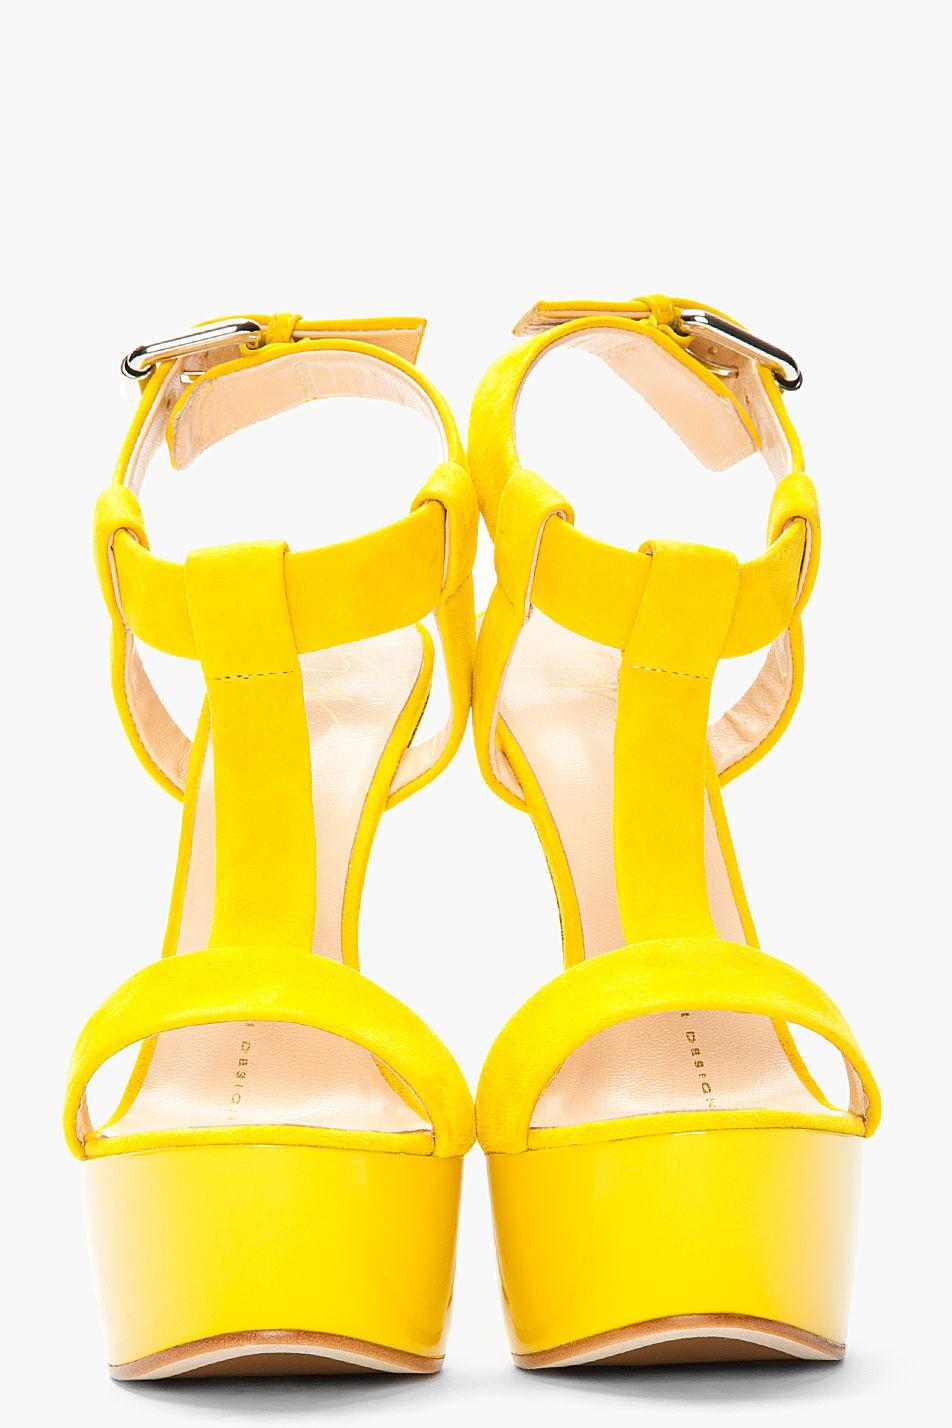 Giuseppe zanotti Dark Yellow Suede Tstrap Jem Heels in Yellow | Lyst